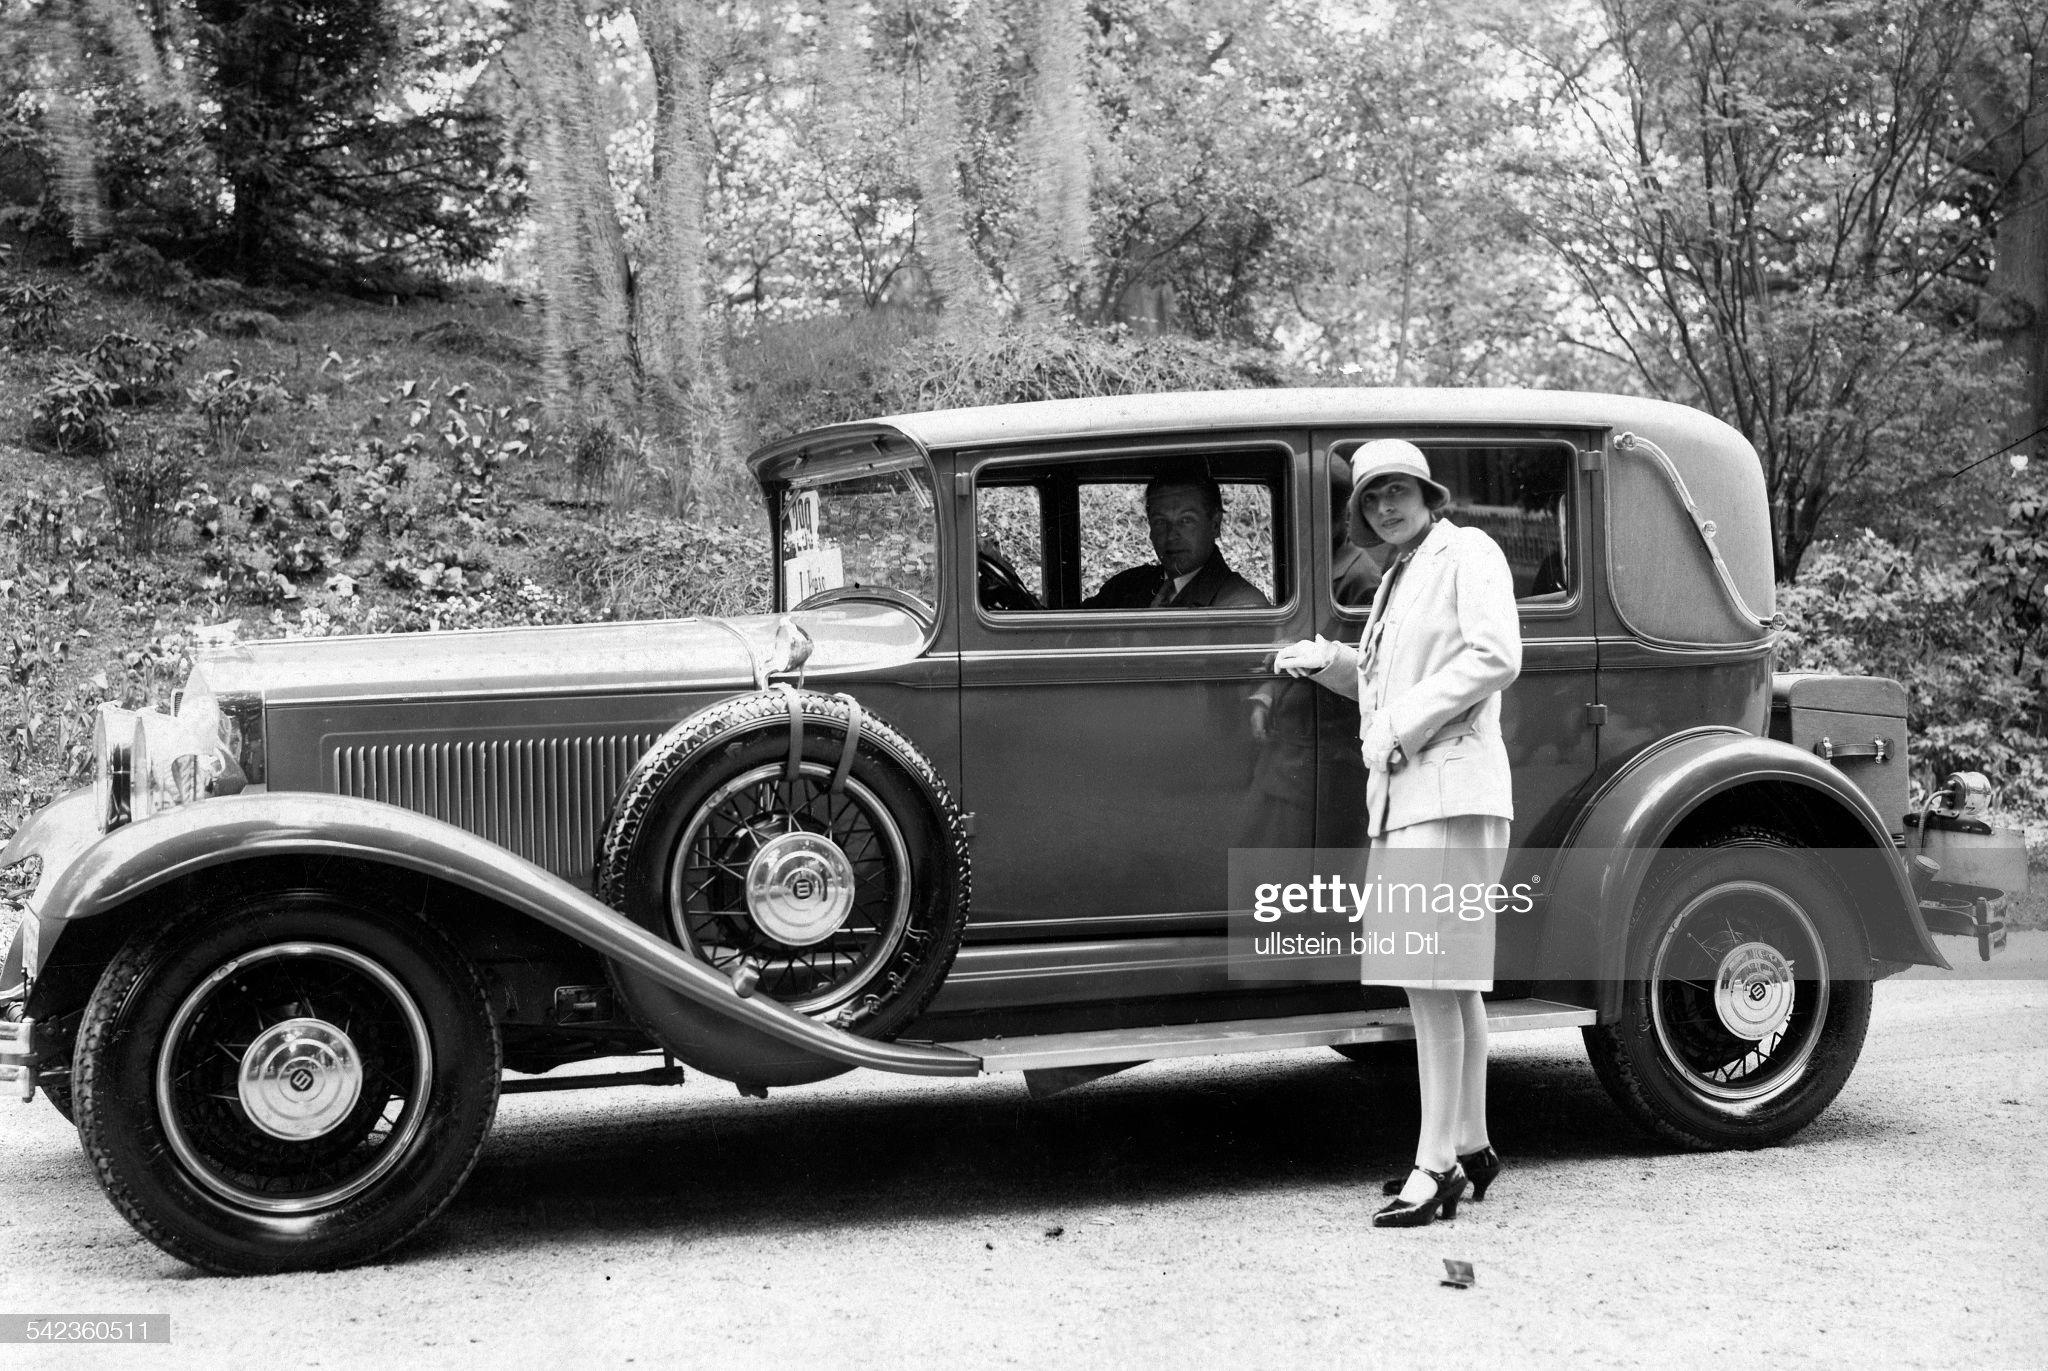 Luxury cars A 20 hp Studebaker - 1929 - Vintage property of ullstein bild : News Photo